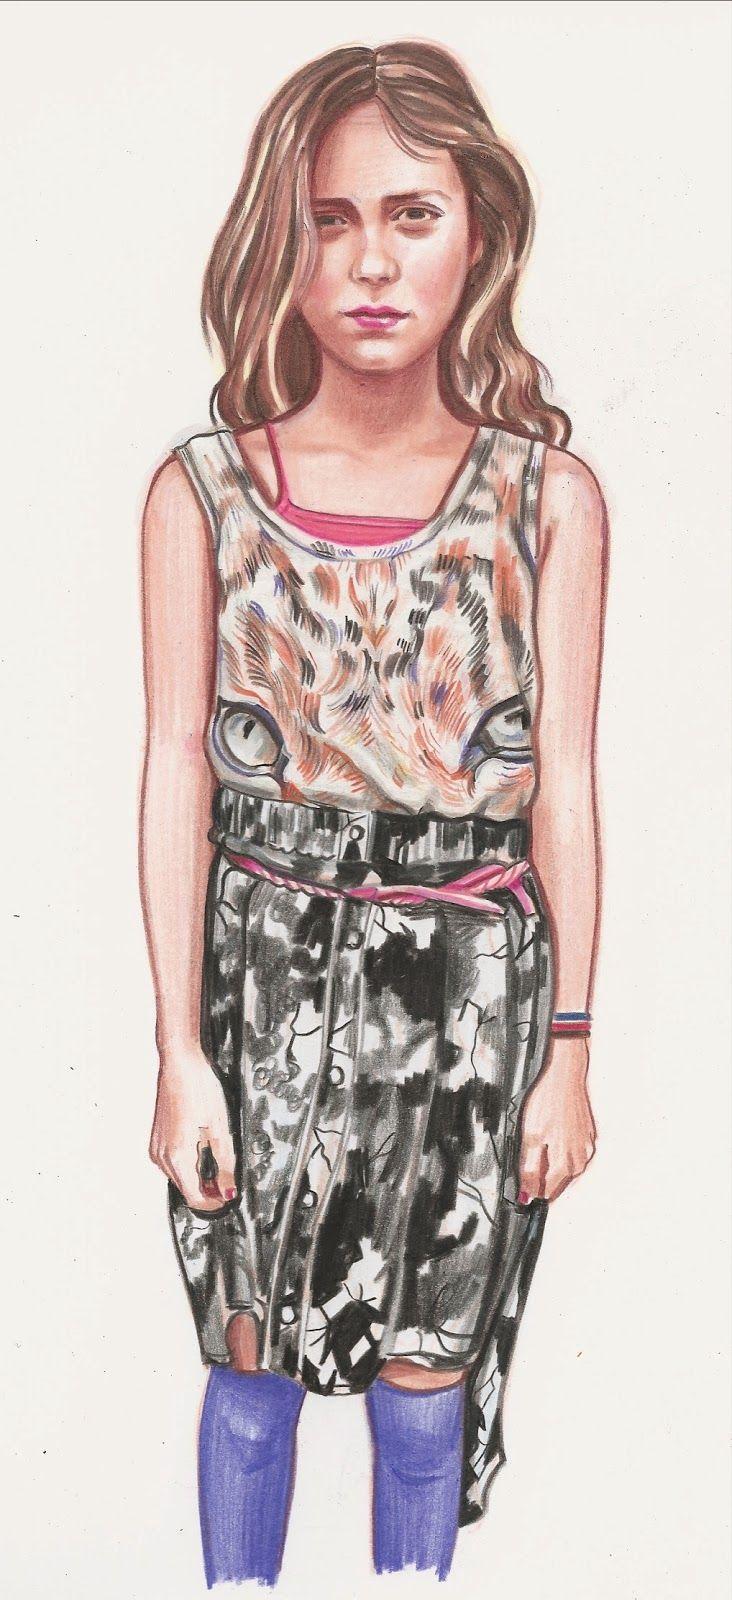 Blog: What My Daughter Wore - Sketching Tween Street Style - Doodlers Anonymous